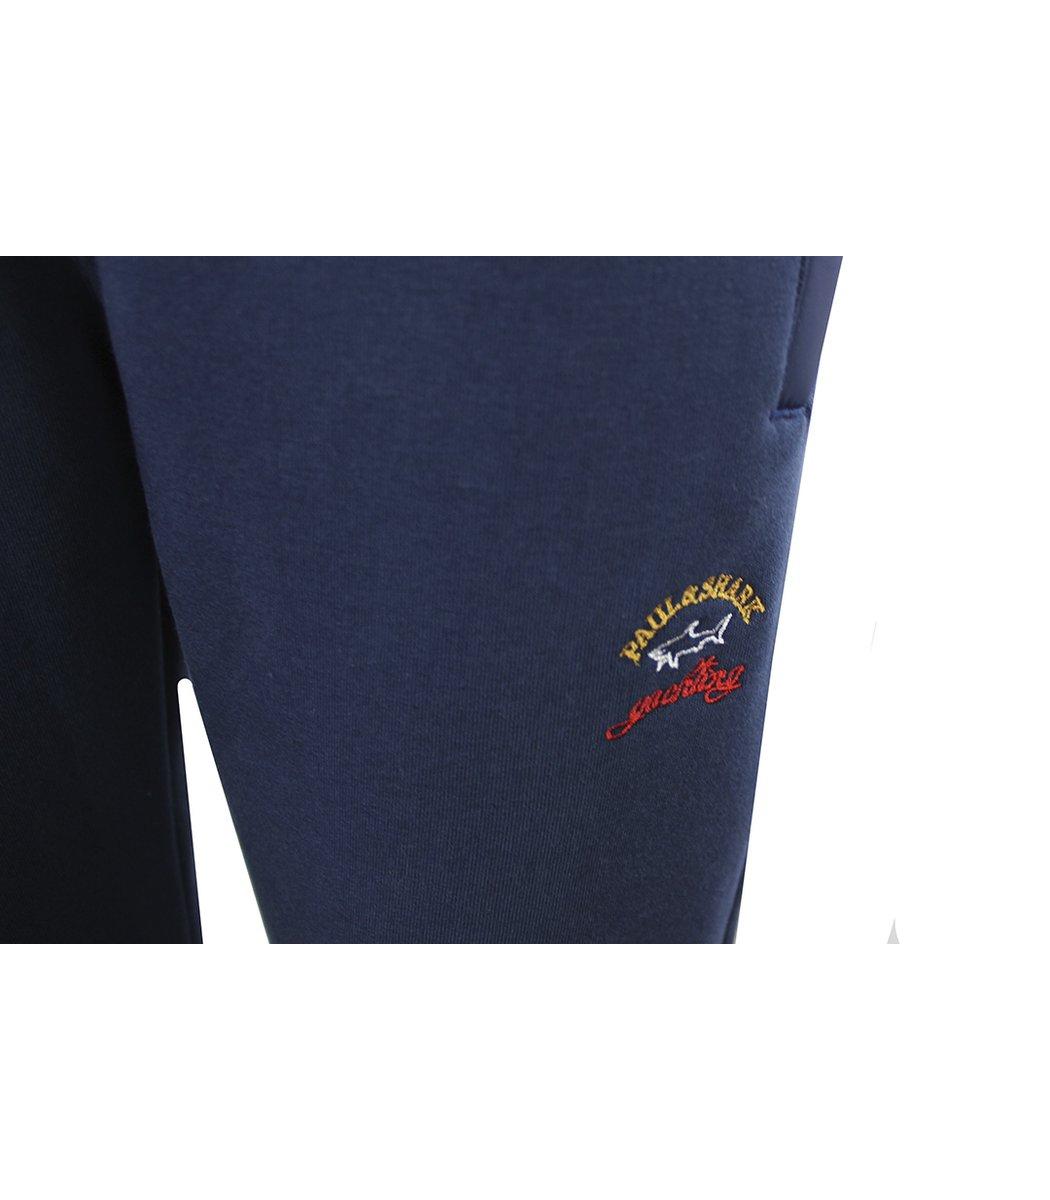 Утепленный синий спортивный костюм Paul&Shark 1481